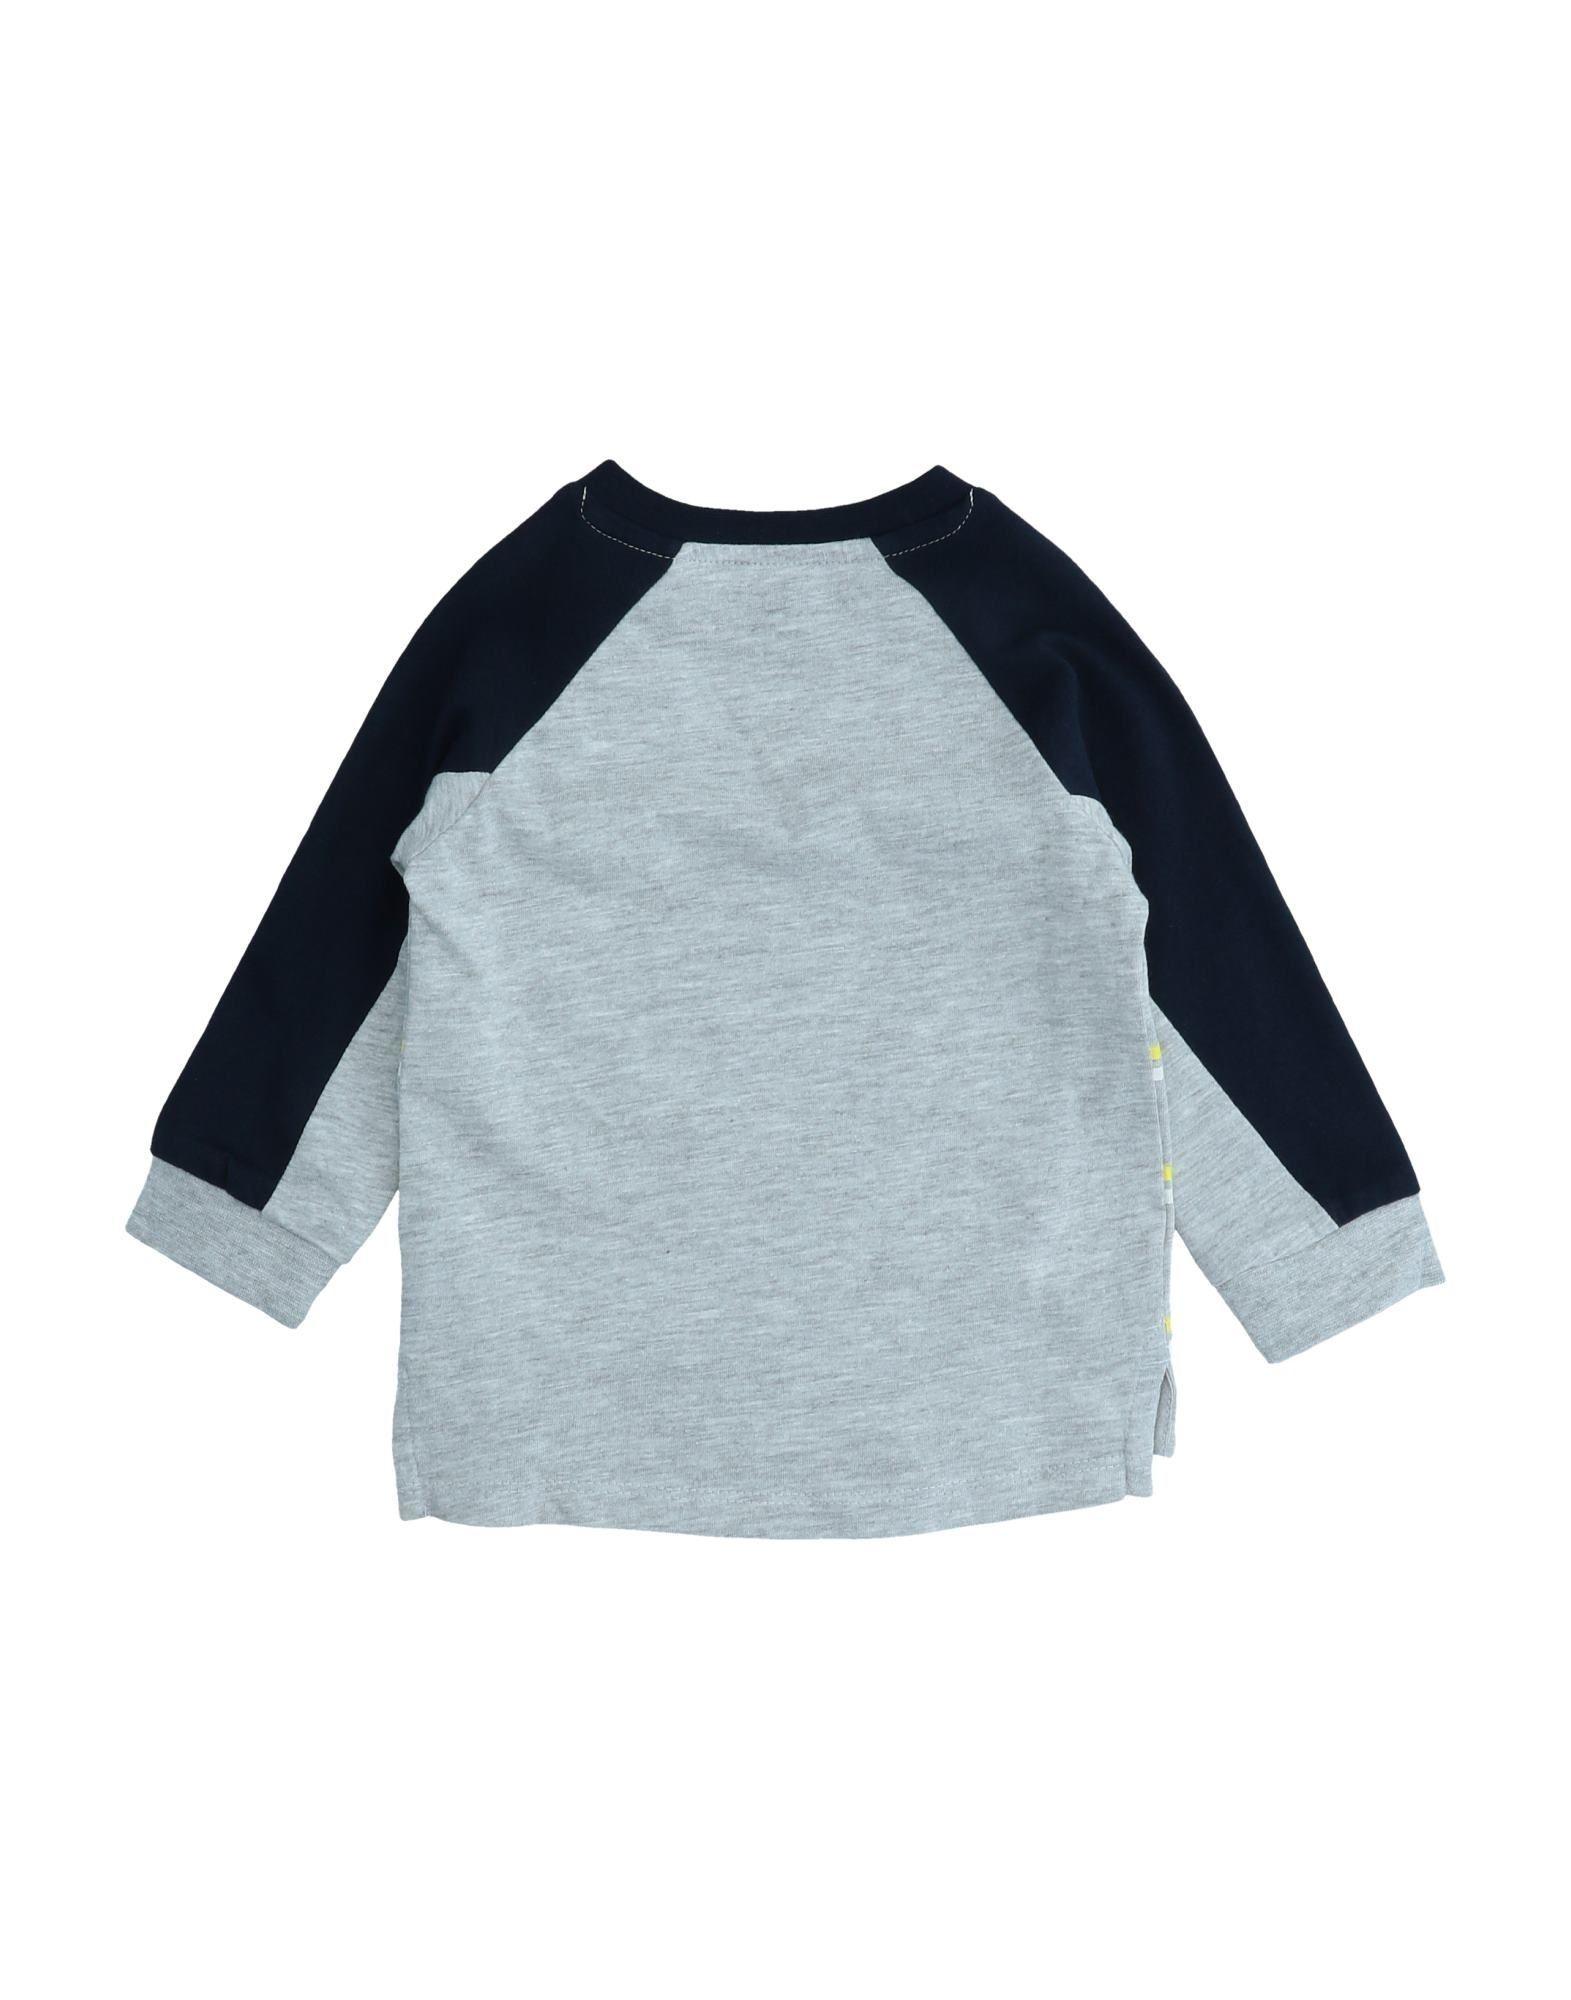 TOPWEAR Boy Esprit Light grey Cotton